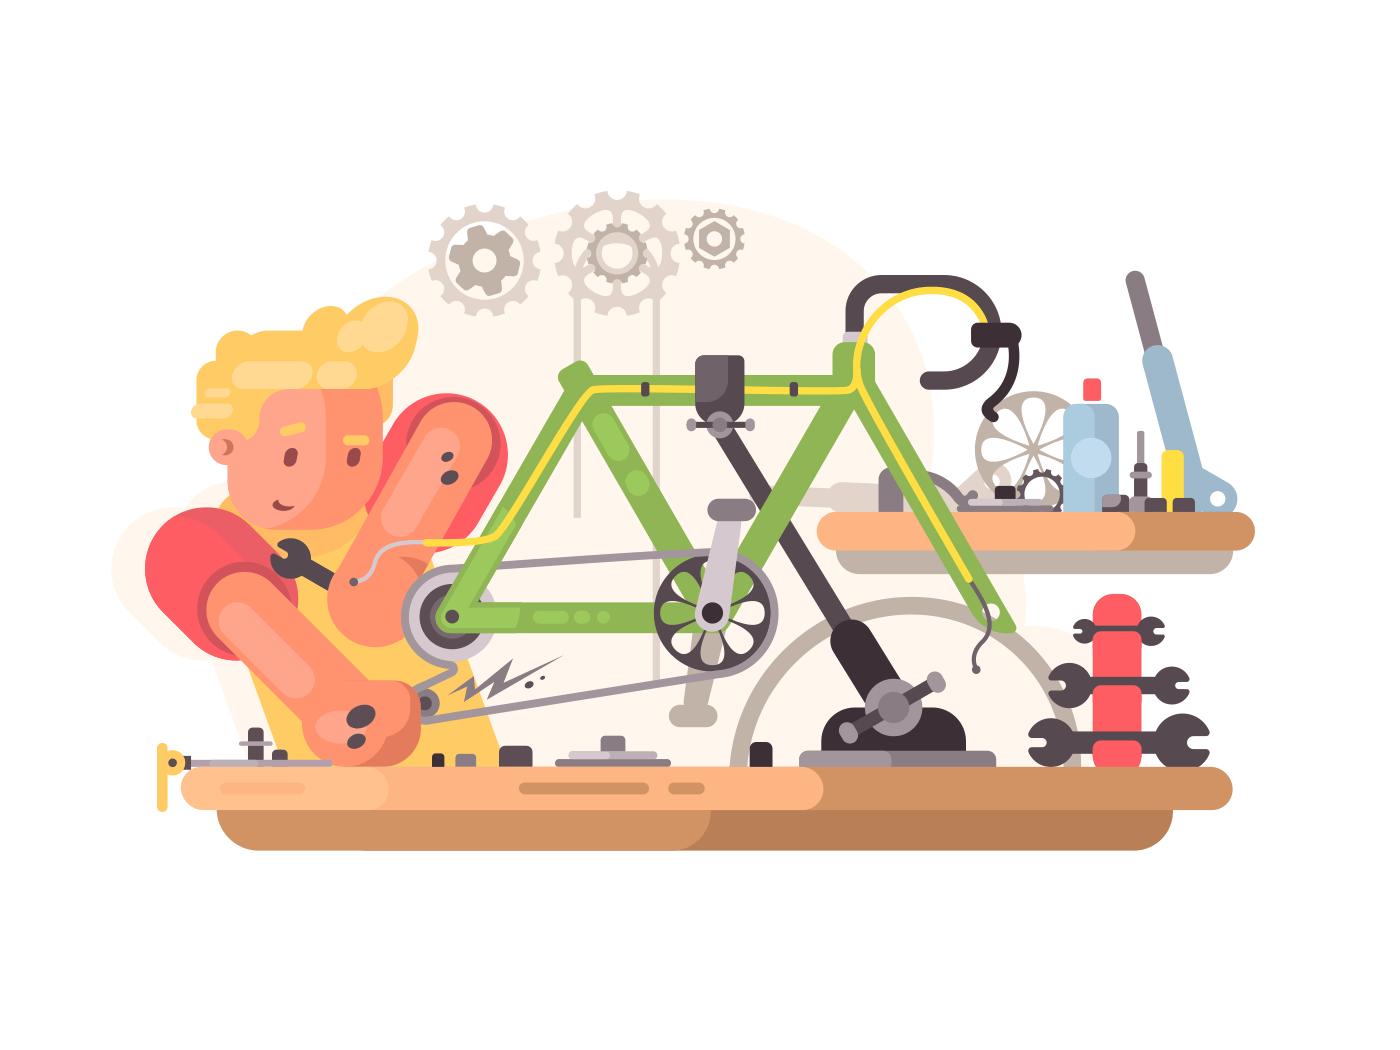 Bicycle repair service illustration